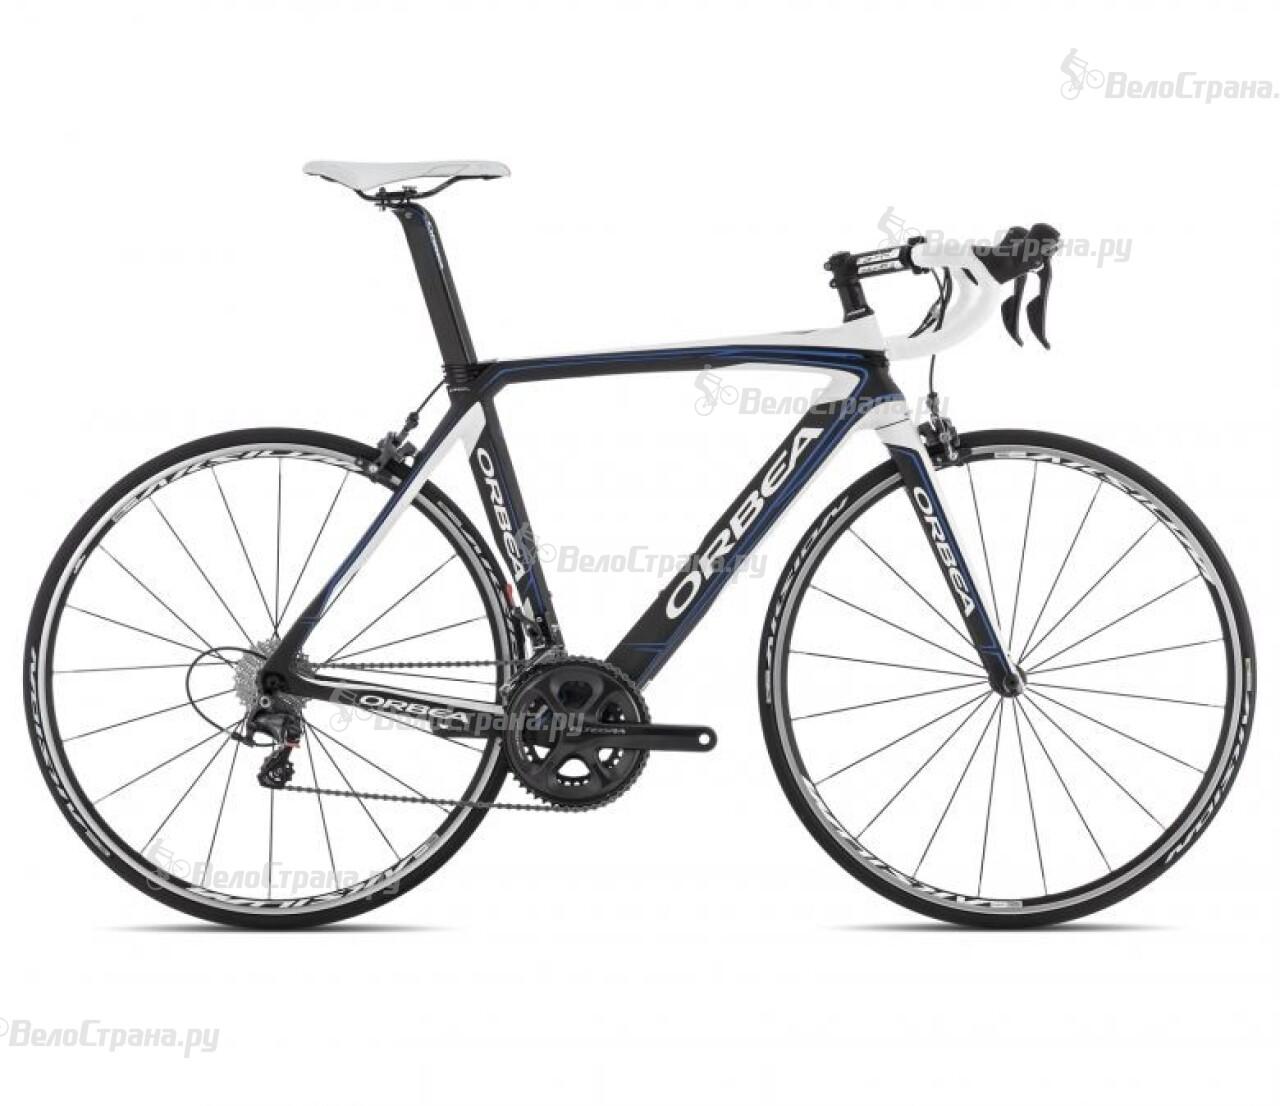 Велосипед Orbea Orca M50 (2014) велосипед wheeler protron 50 2014